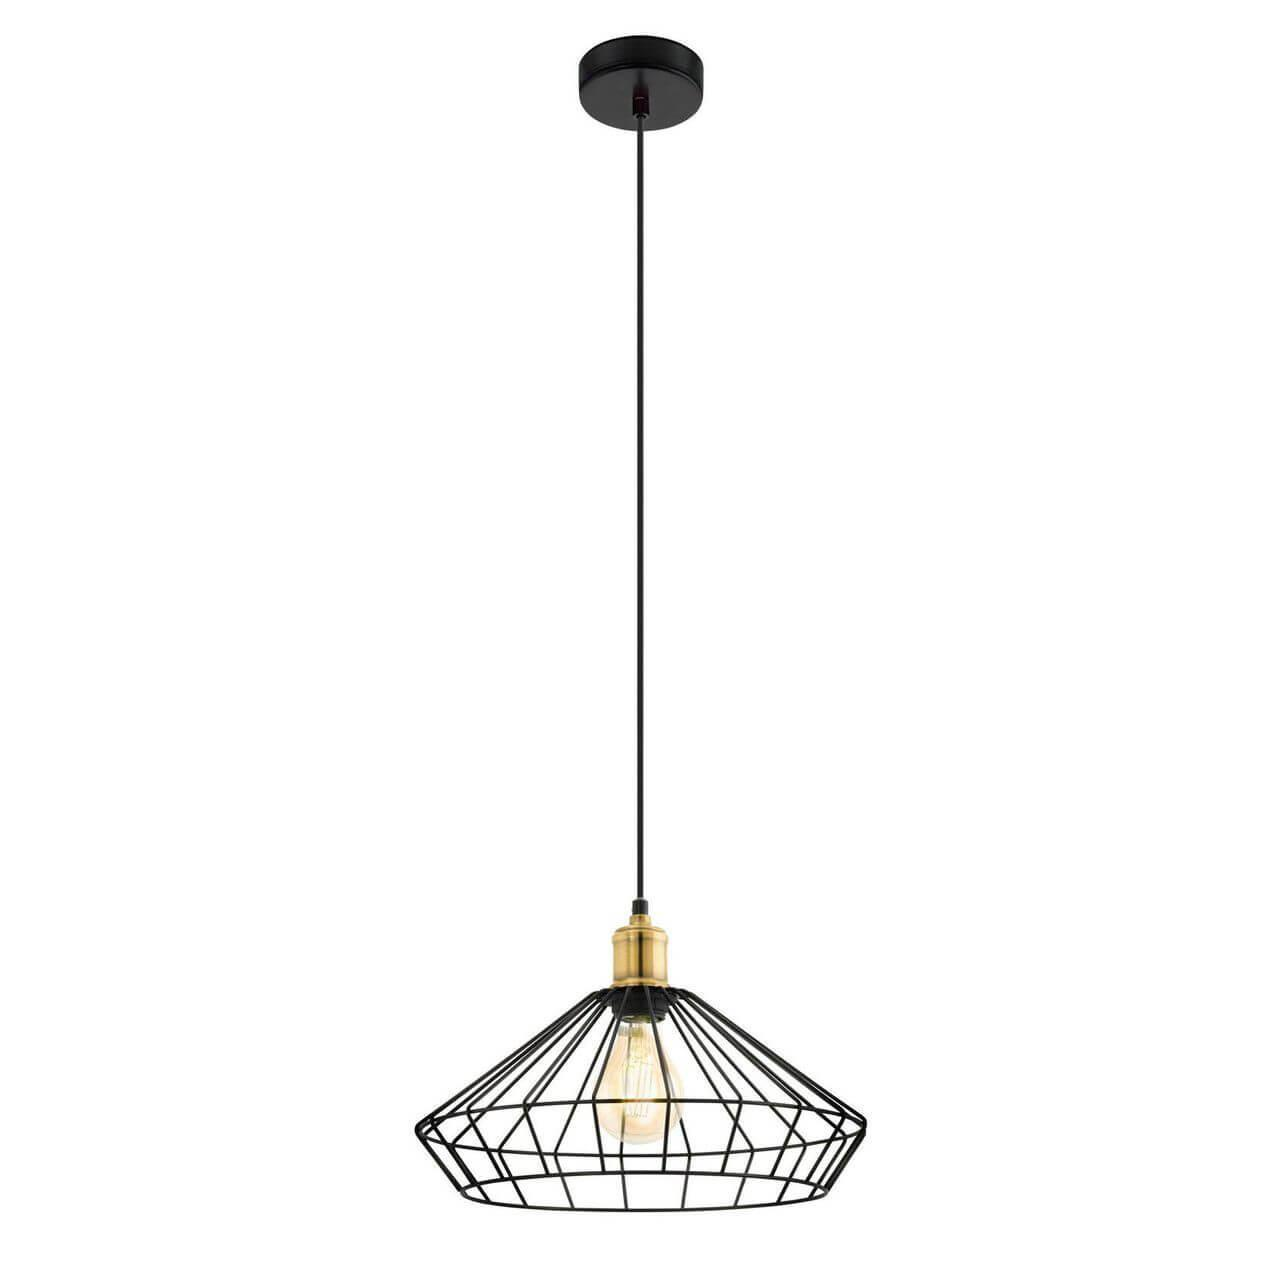 Подвесной светильник Eglo 49788, E27, 60 Вт цена